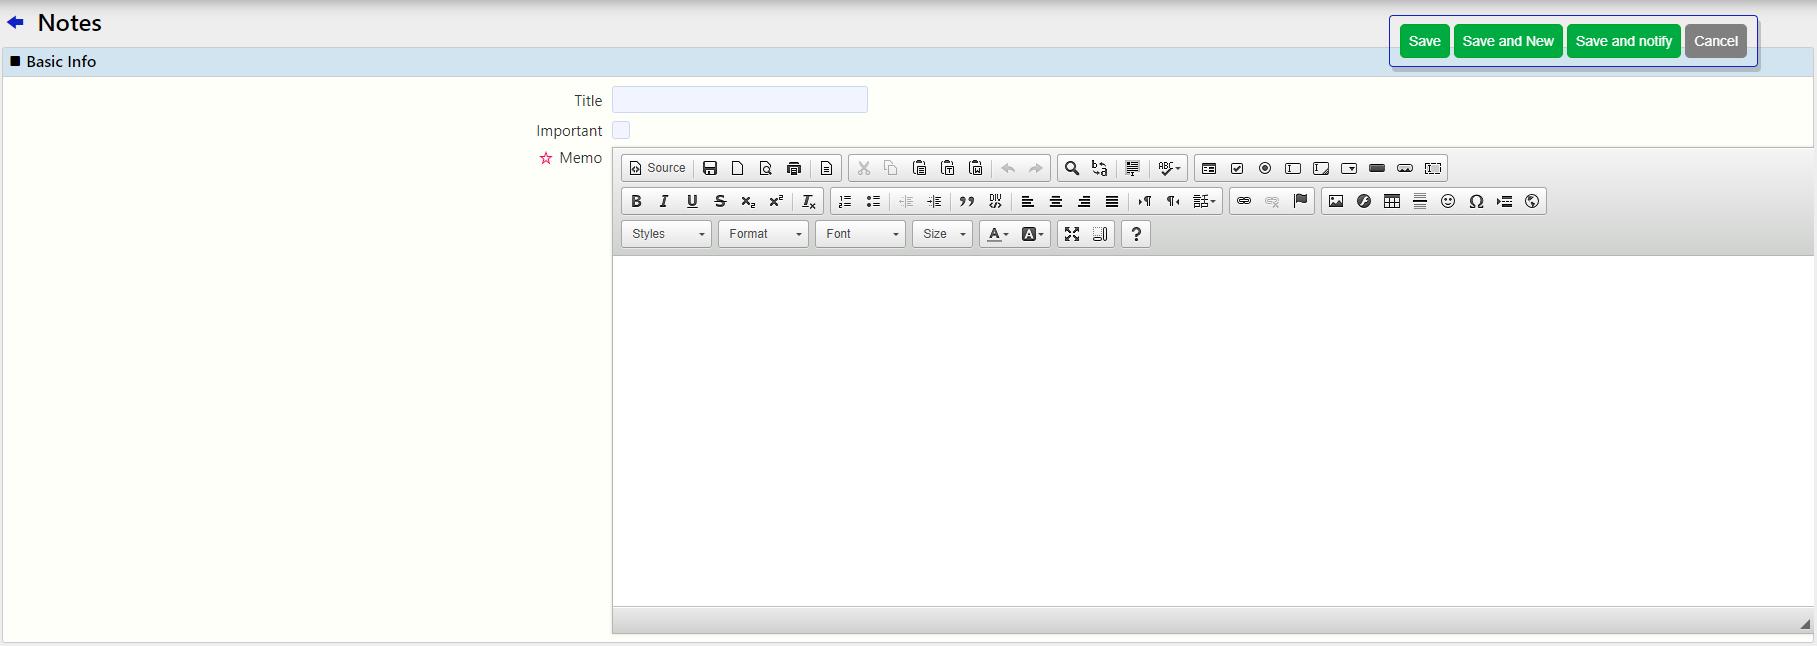 Create a note / Comidor Digital Automation platform